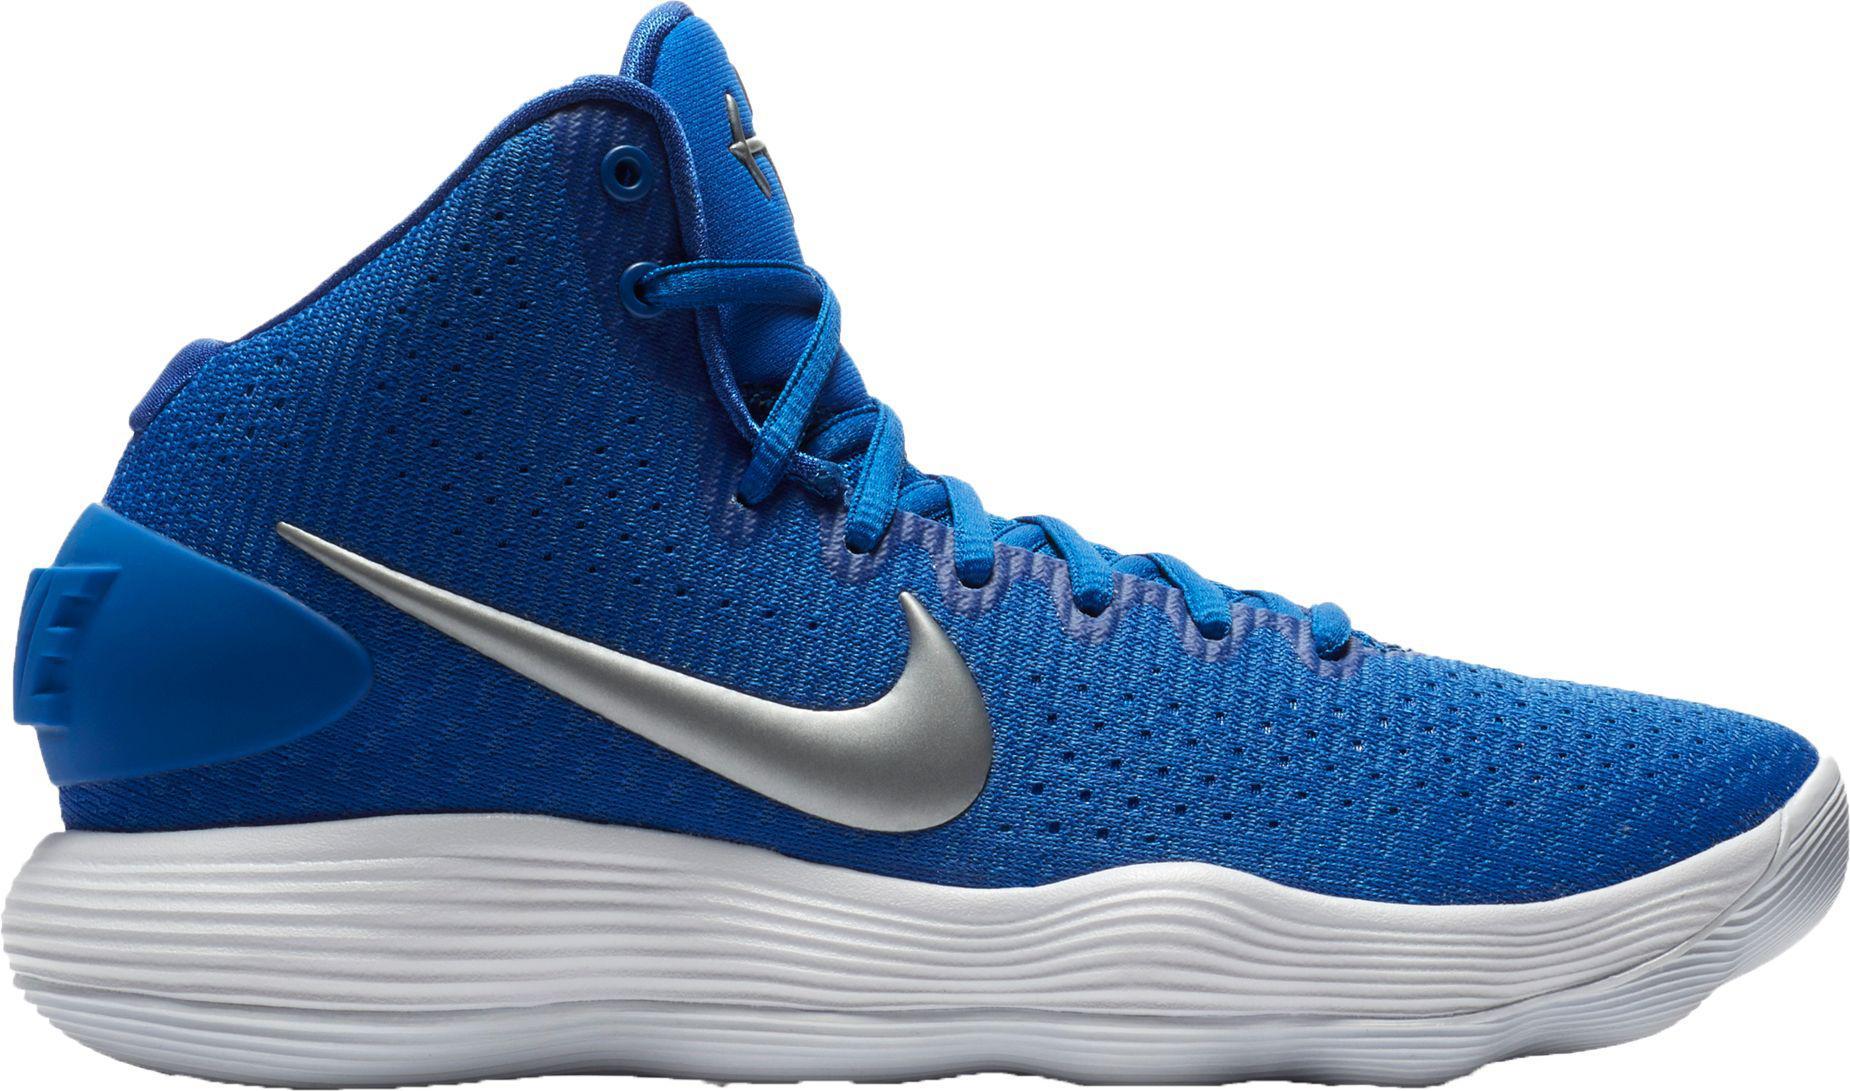 reputable site abc05 9fcd5 ... 50% off nike. mens blue hyperdunk 2017 basketball shoes a5ffb 61800  spain ...